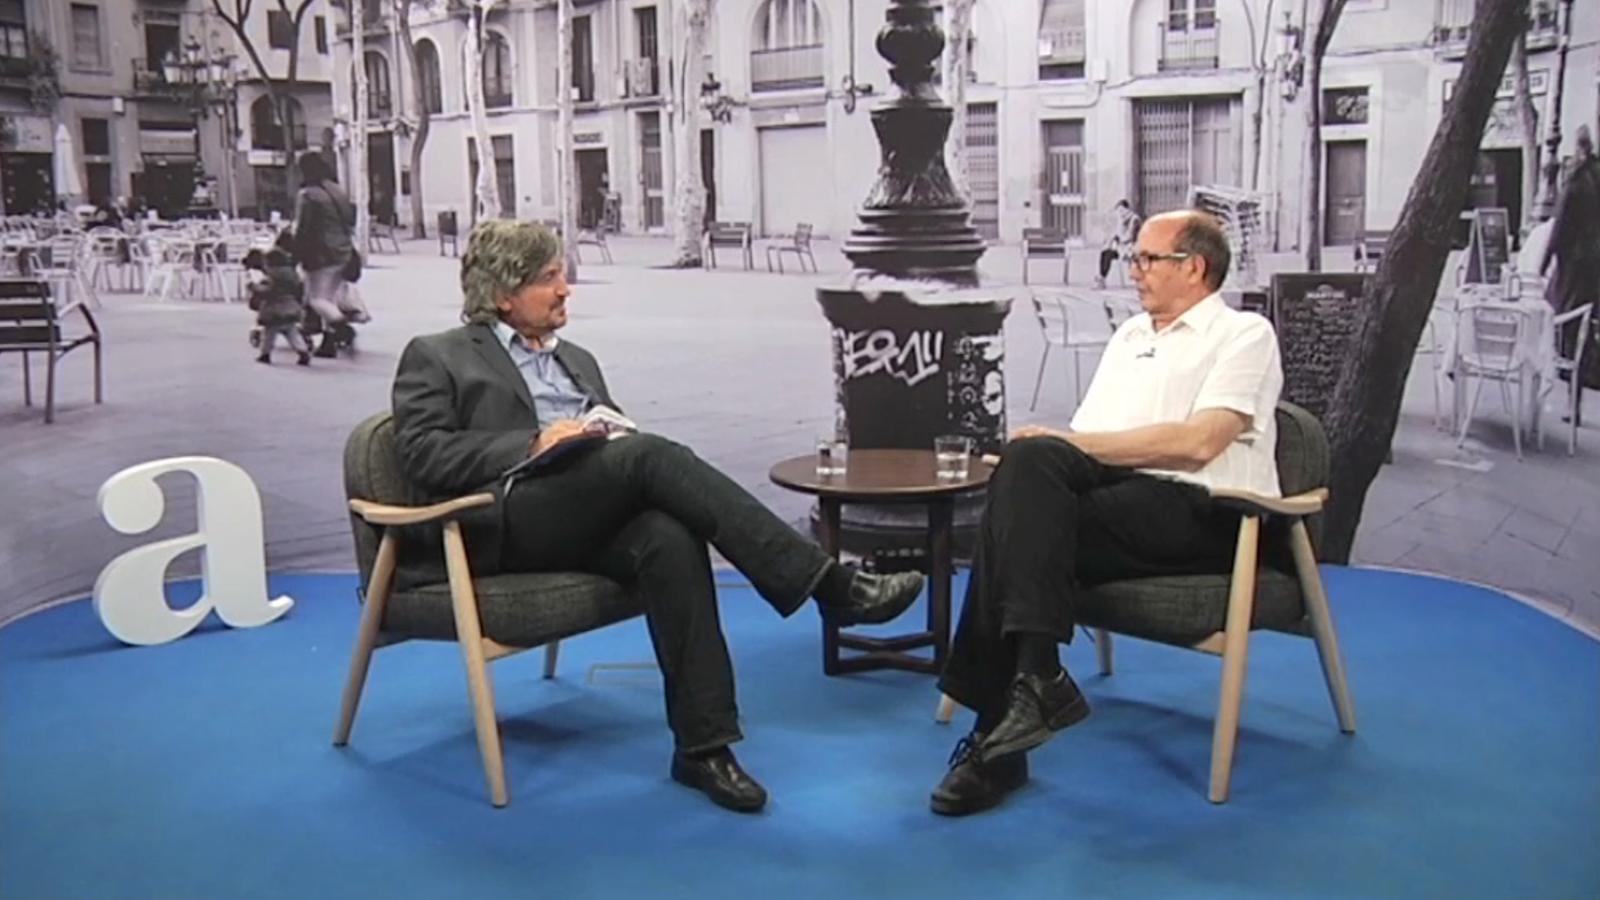 Entrevista de Carles Capdevila a Jaume Cela